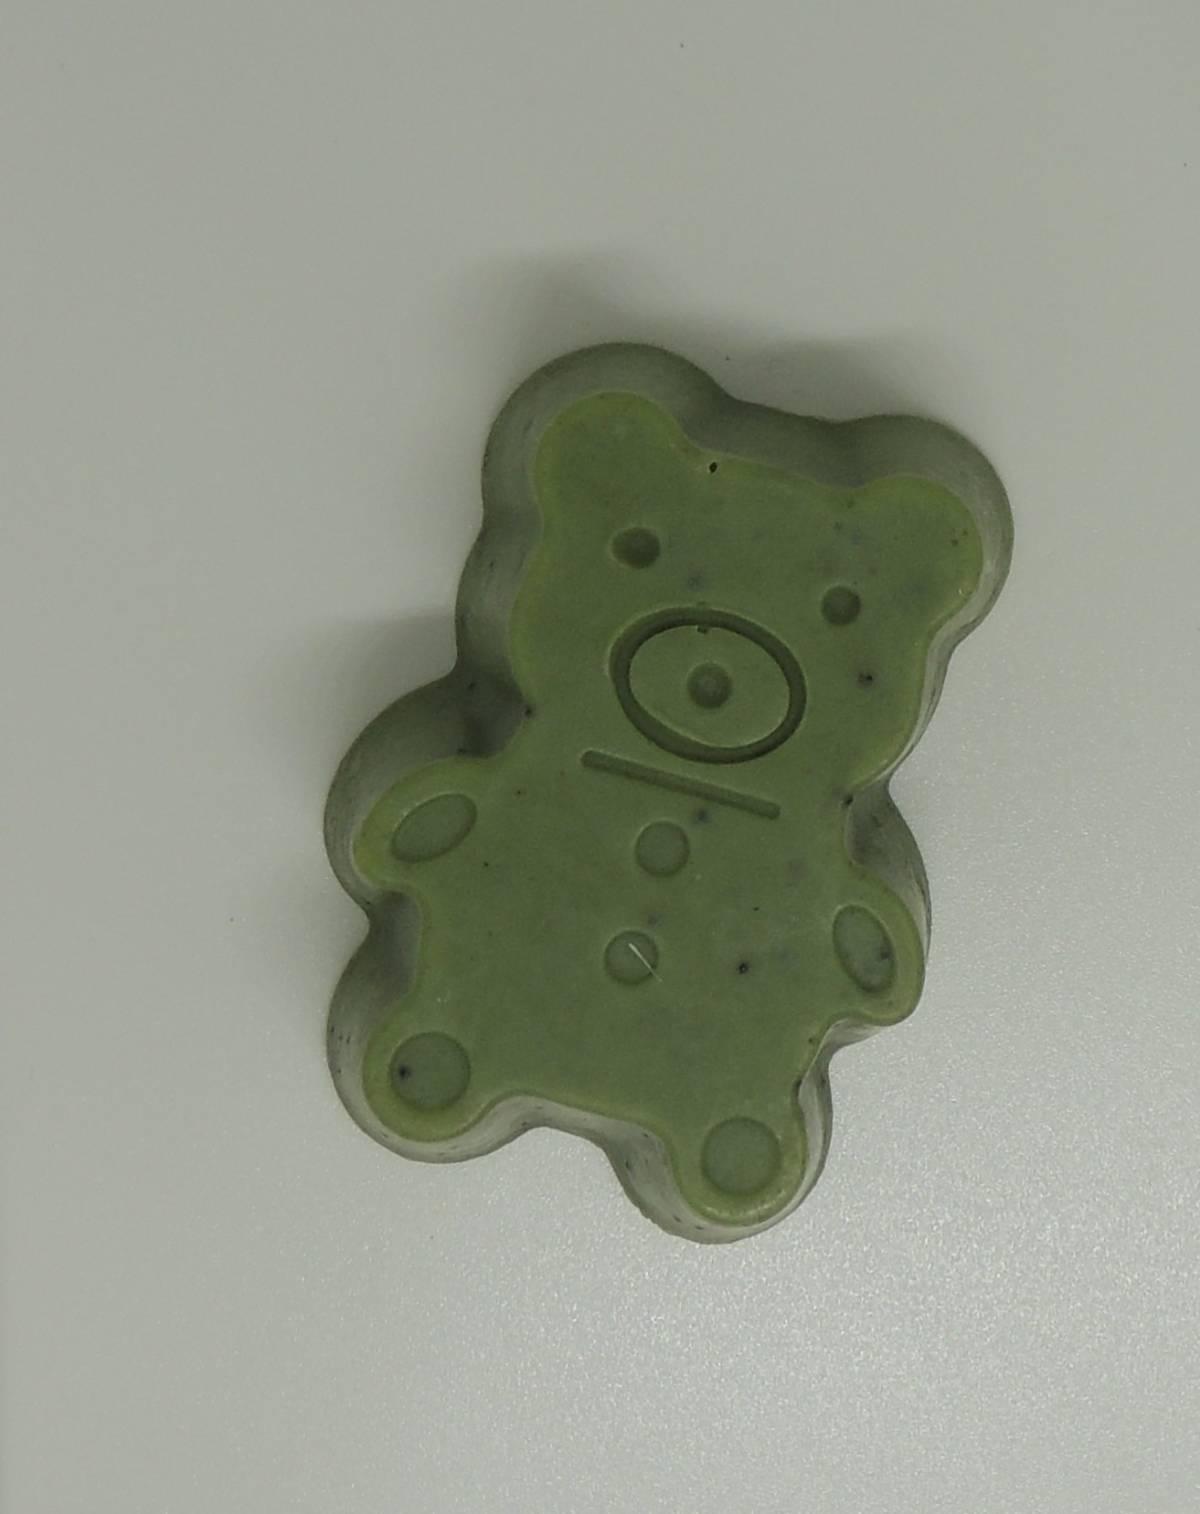 GREEN SPRING BEAR CUB